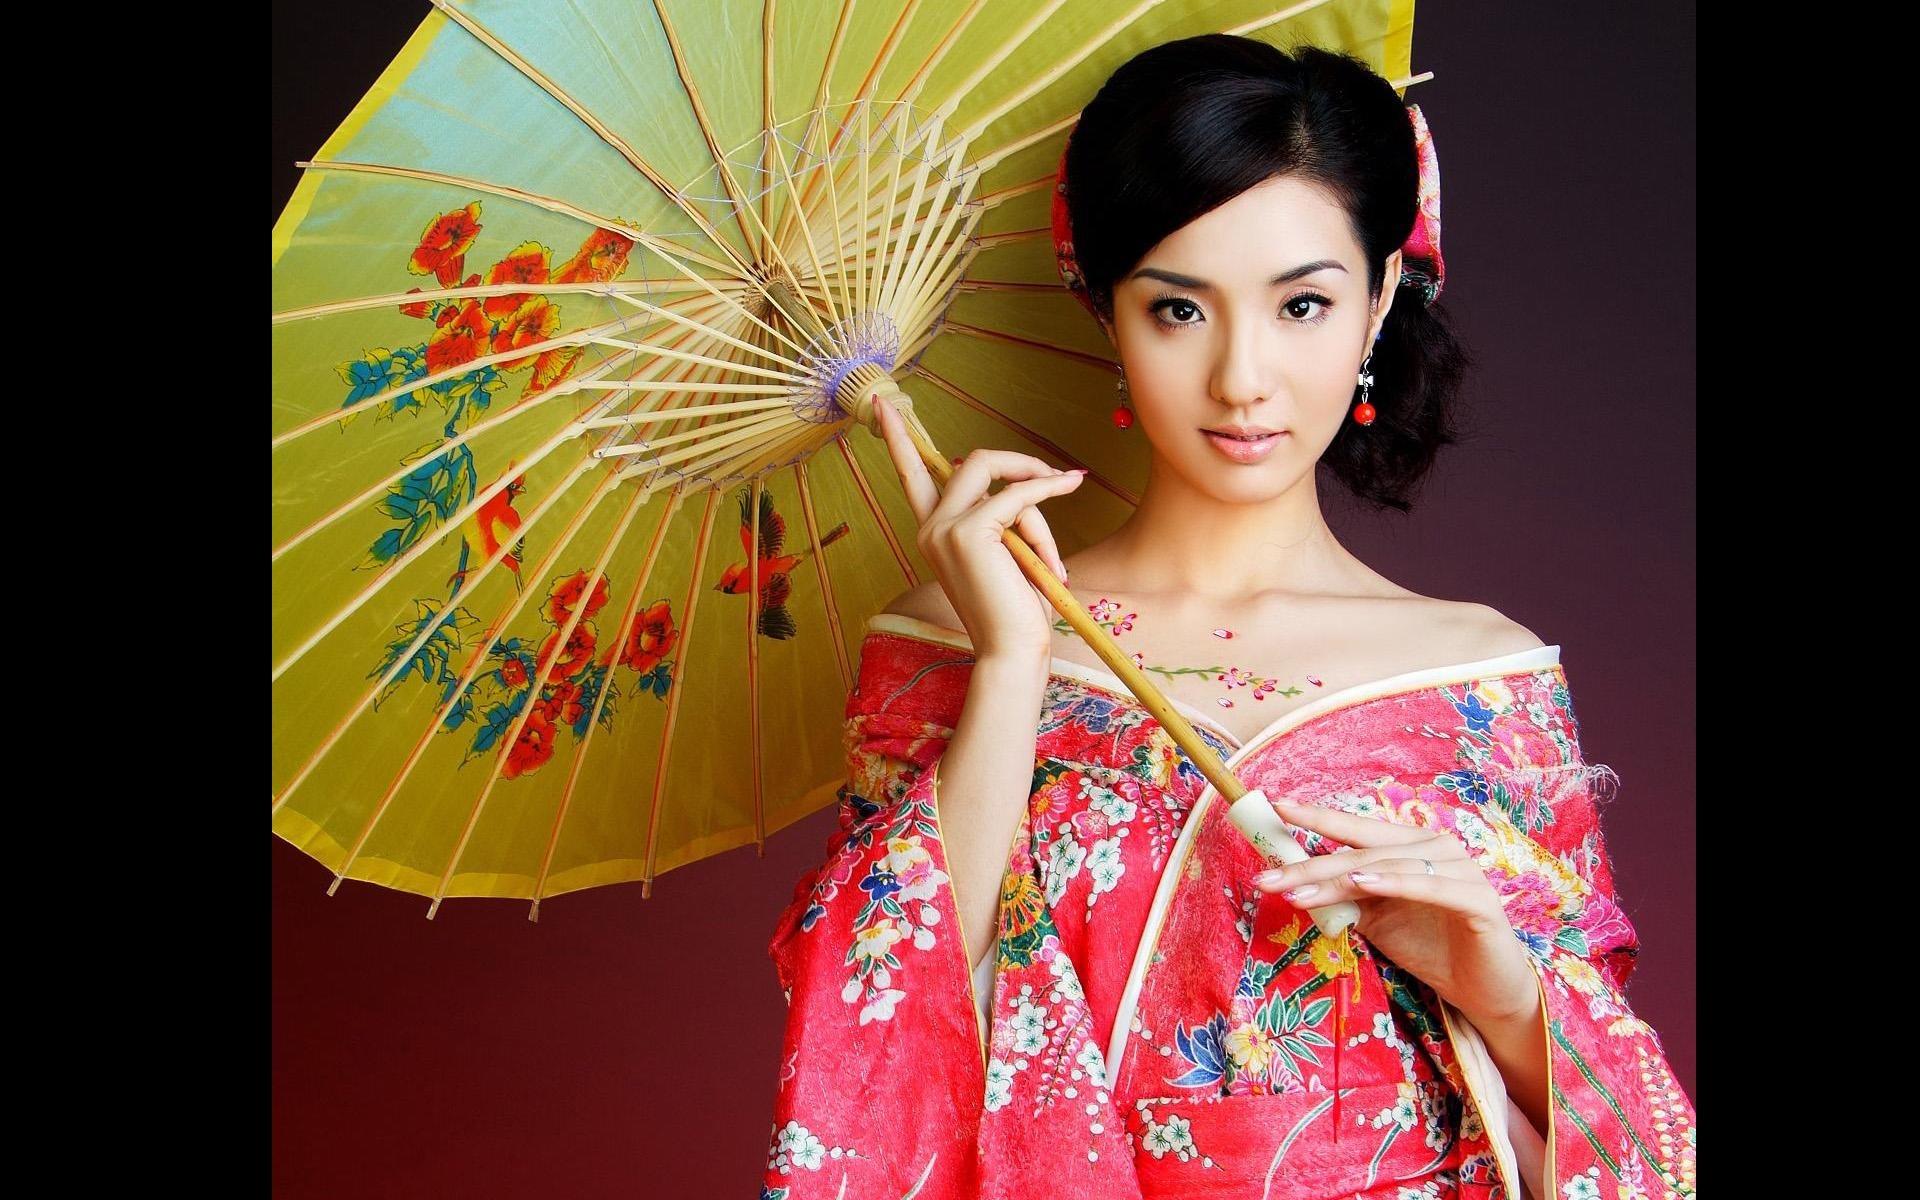 Фото девушек и китайцев